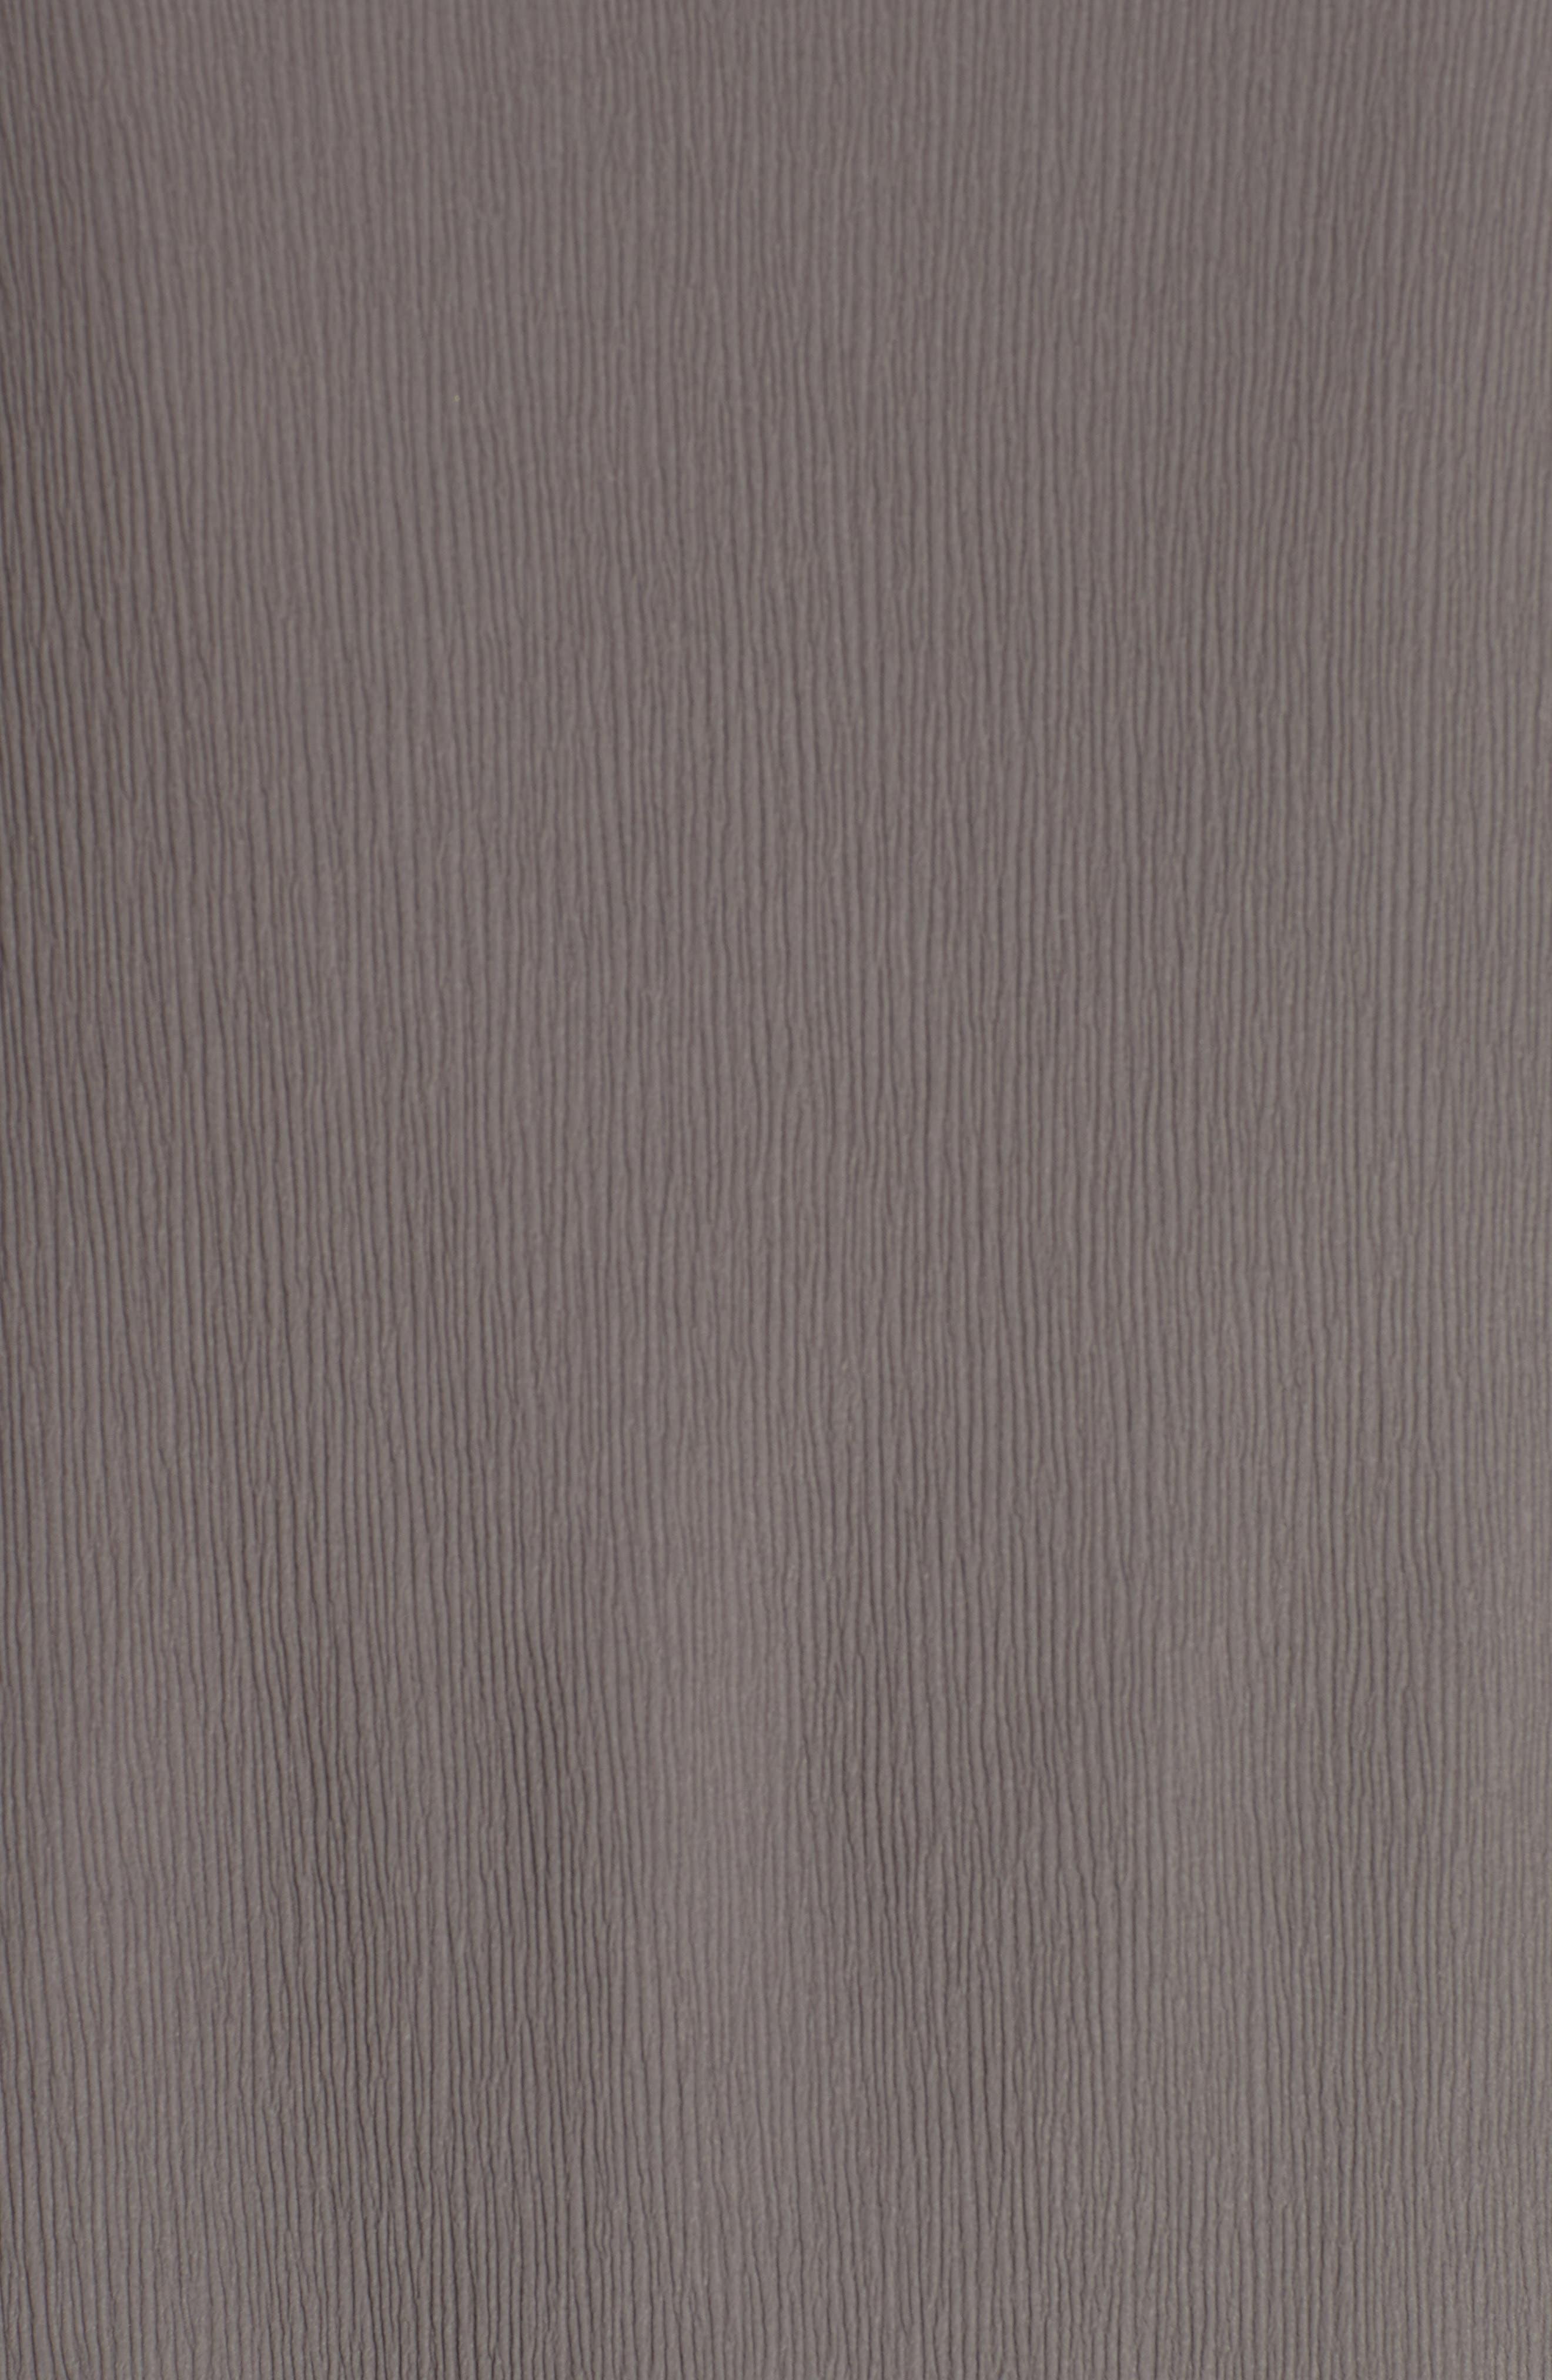 Knit Trim Chiffon Blouse,                             Alternate thumbnail 5, color,                             021